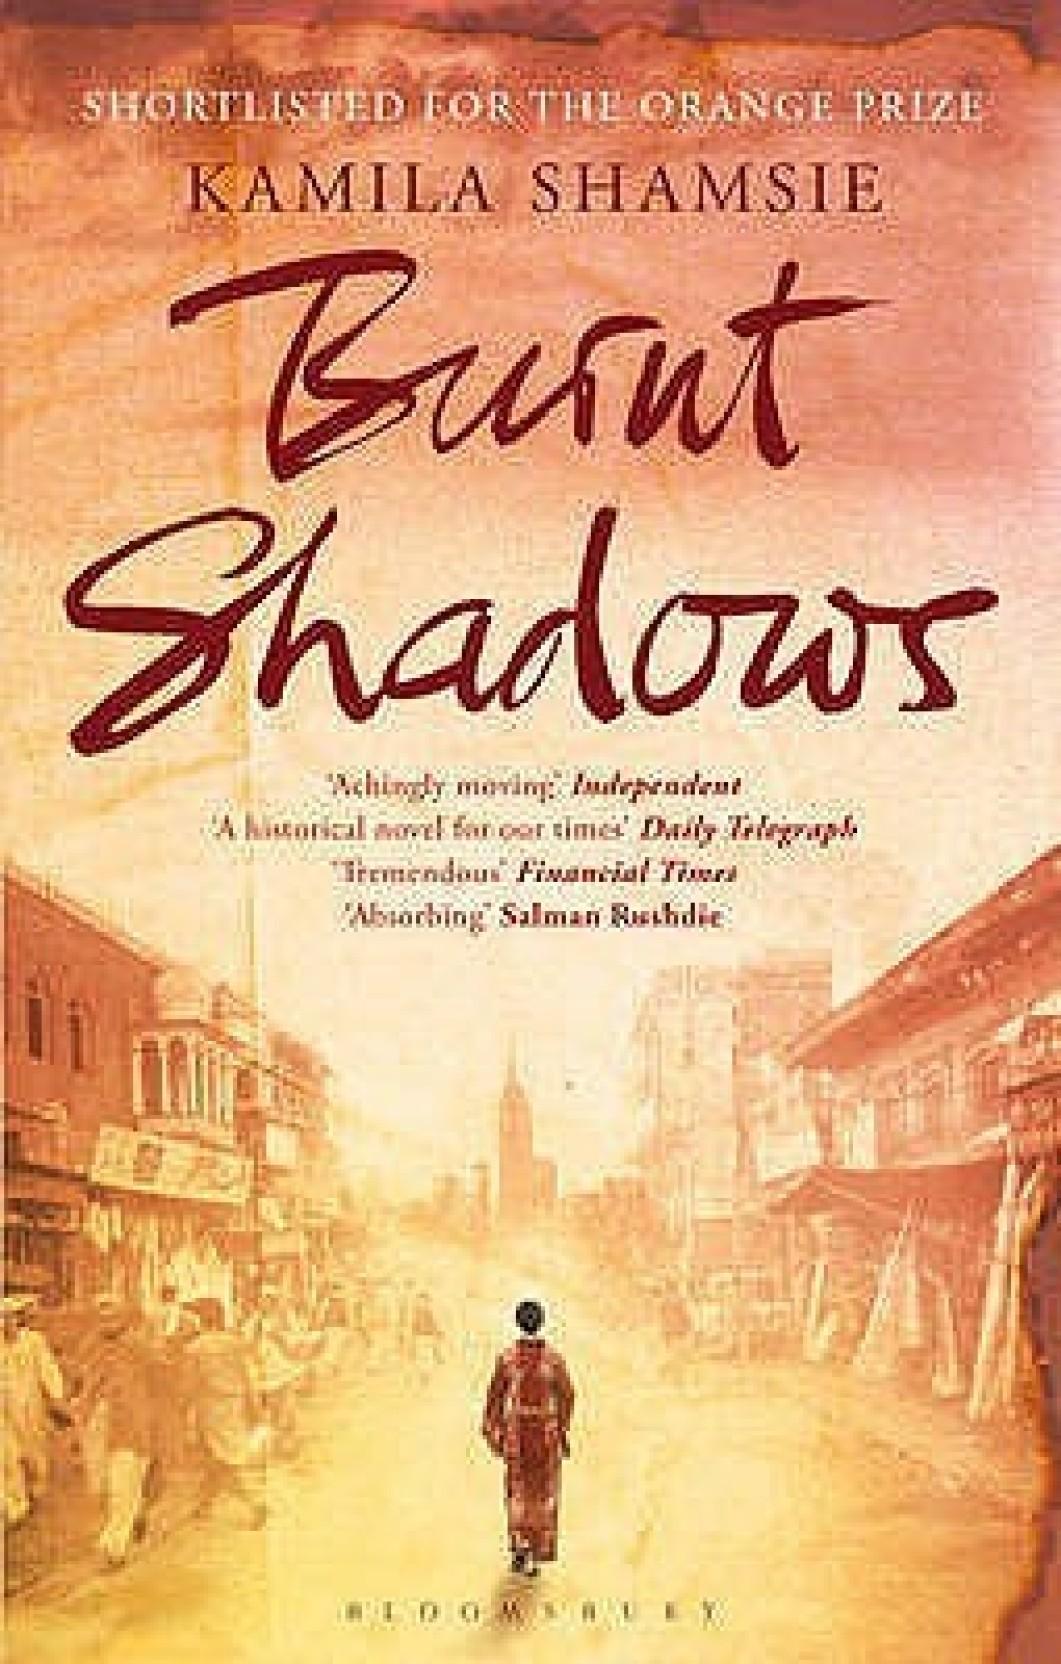 Burnt Shadows. ADD TO CART